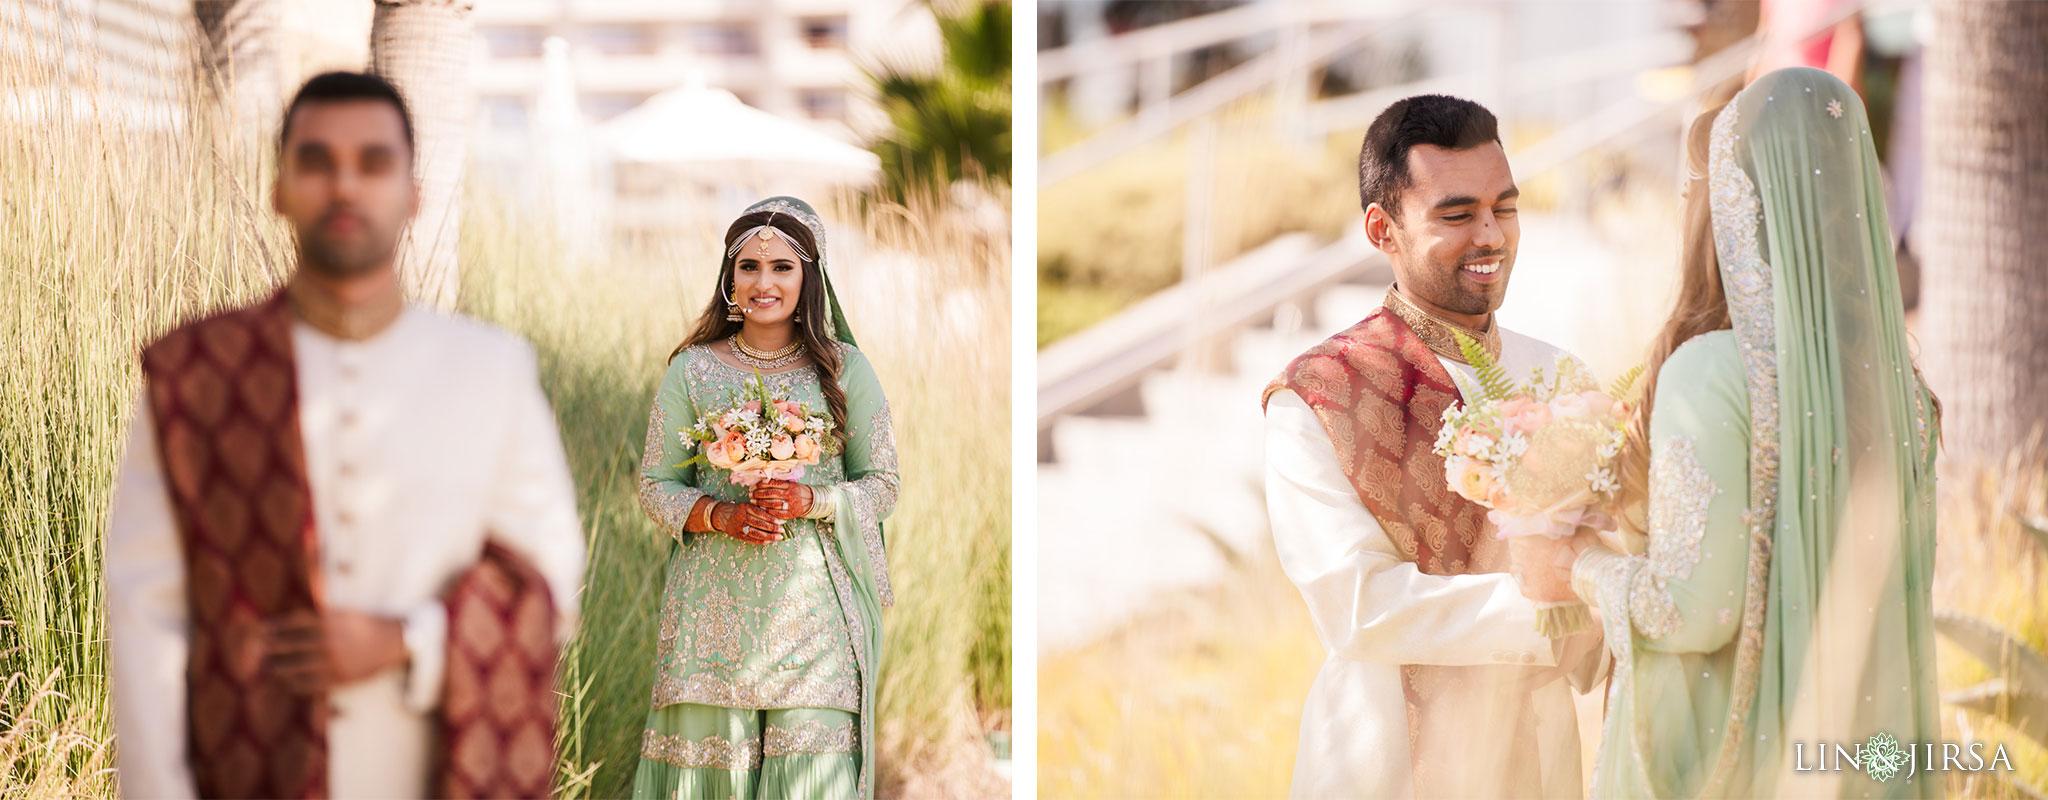 010 pasea hotel huntington beach pakistani muslim wedding photography